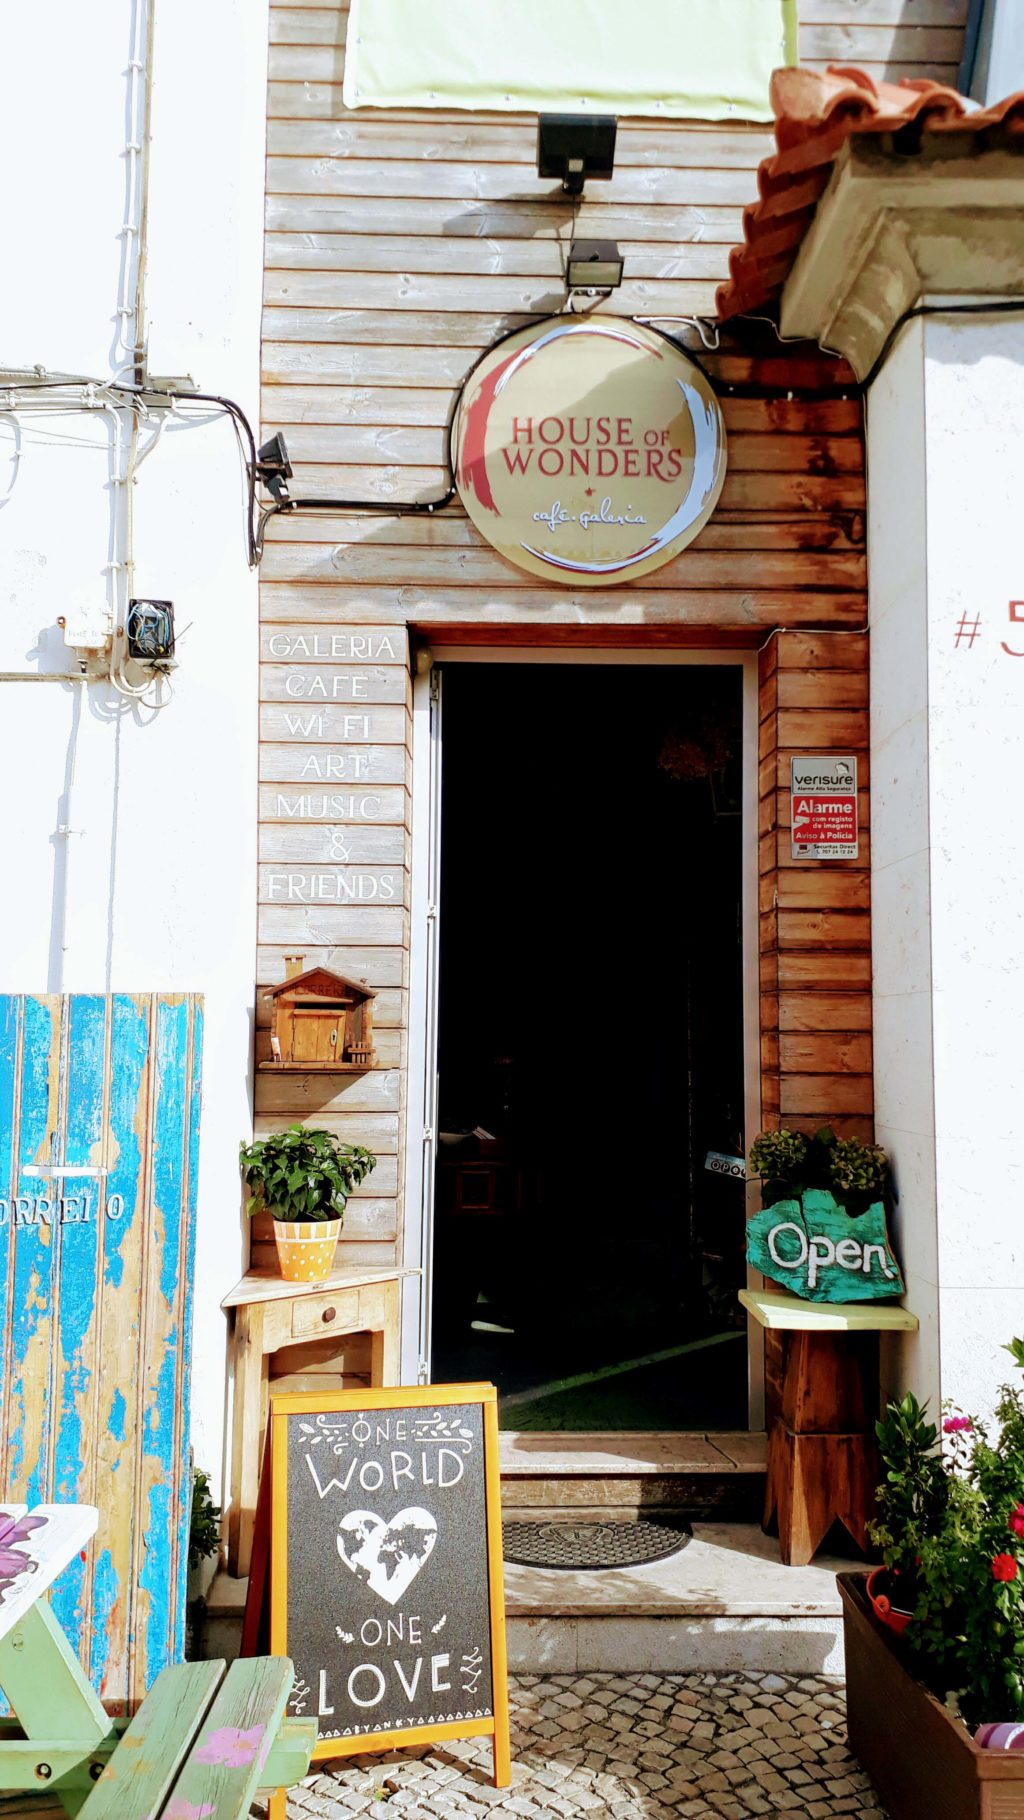 Cafe Galeria House of Wonders